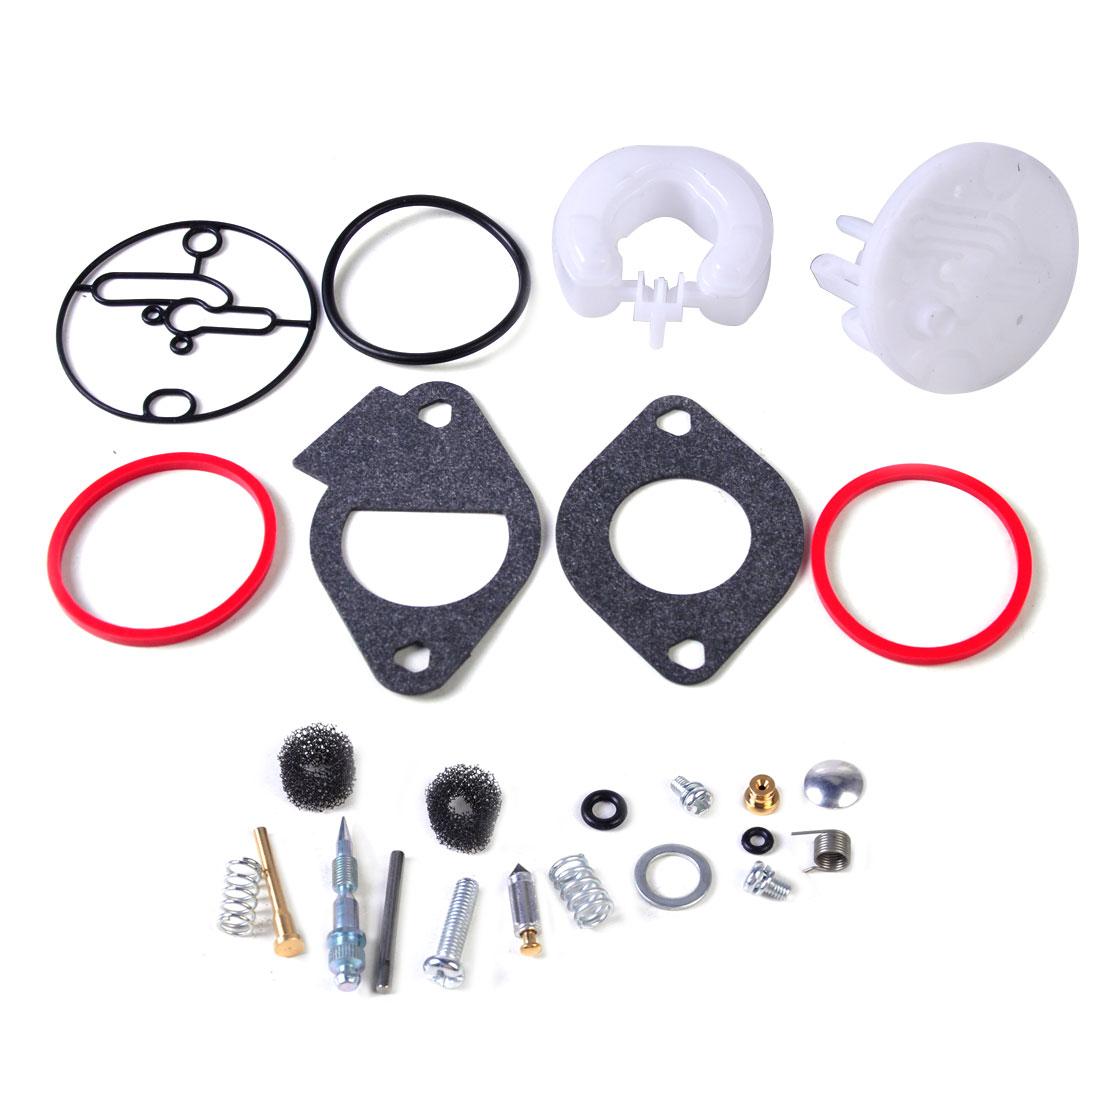 LETAOSK carburador Kit de reparación de reconstrucción apto para Niki Carb Briggs & Stratton Master Overhaul 796184 Accesorios